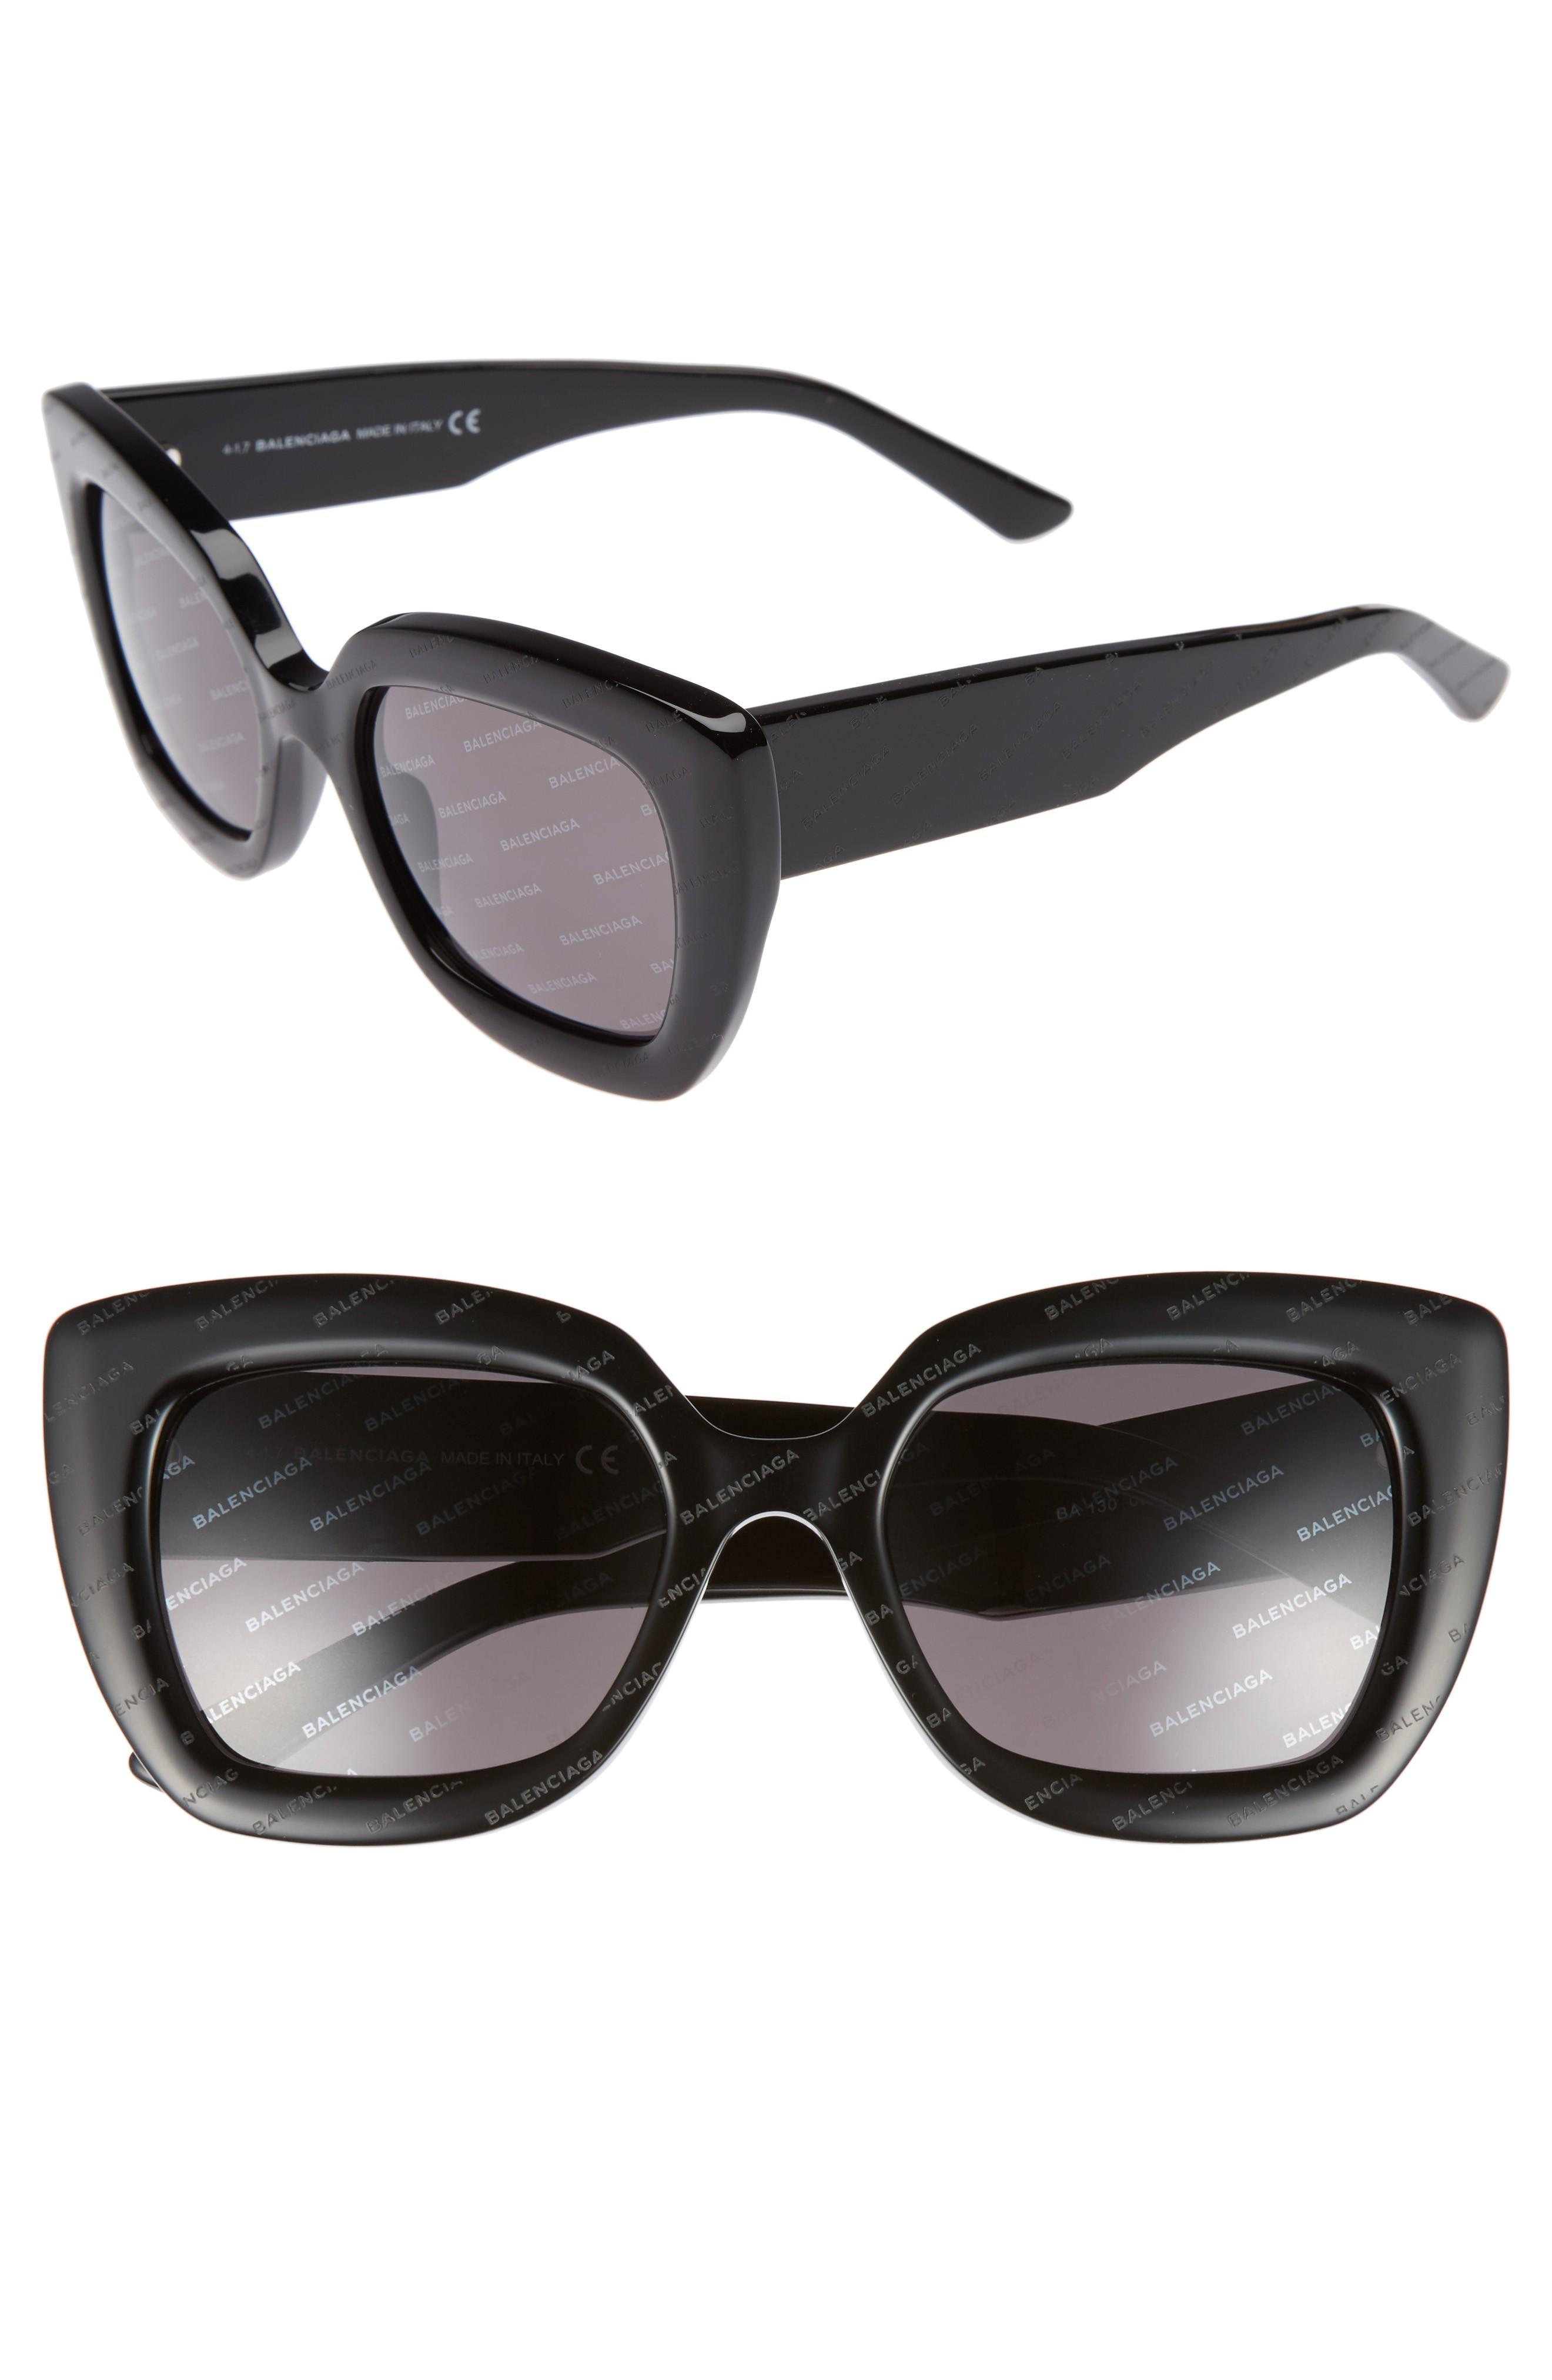 210d2e951a1e Balenciaga 52Mm Cat Eye Sunglasses - Black With Logomania/ Smoke ...